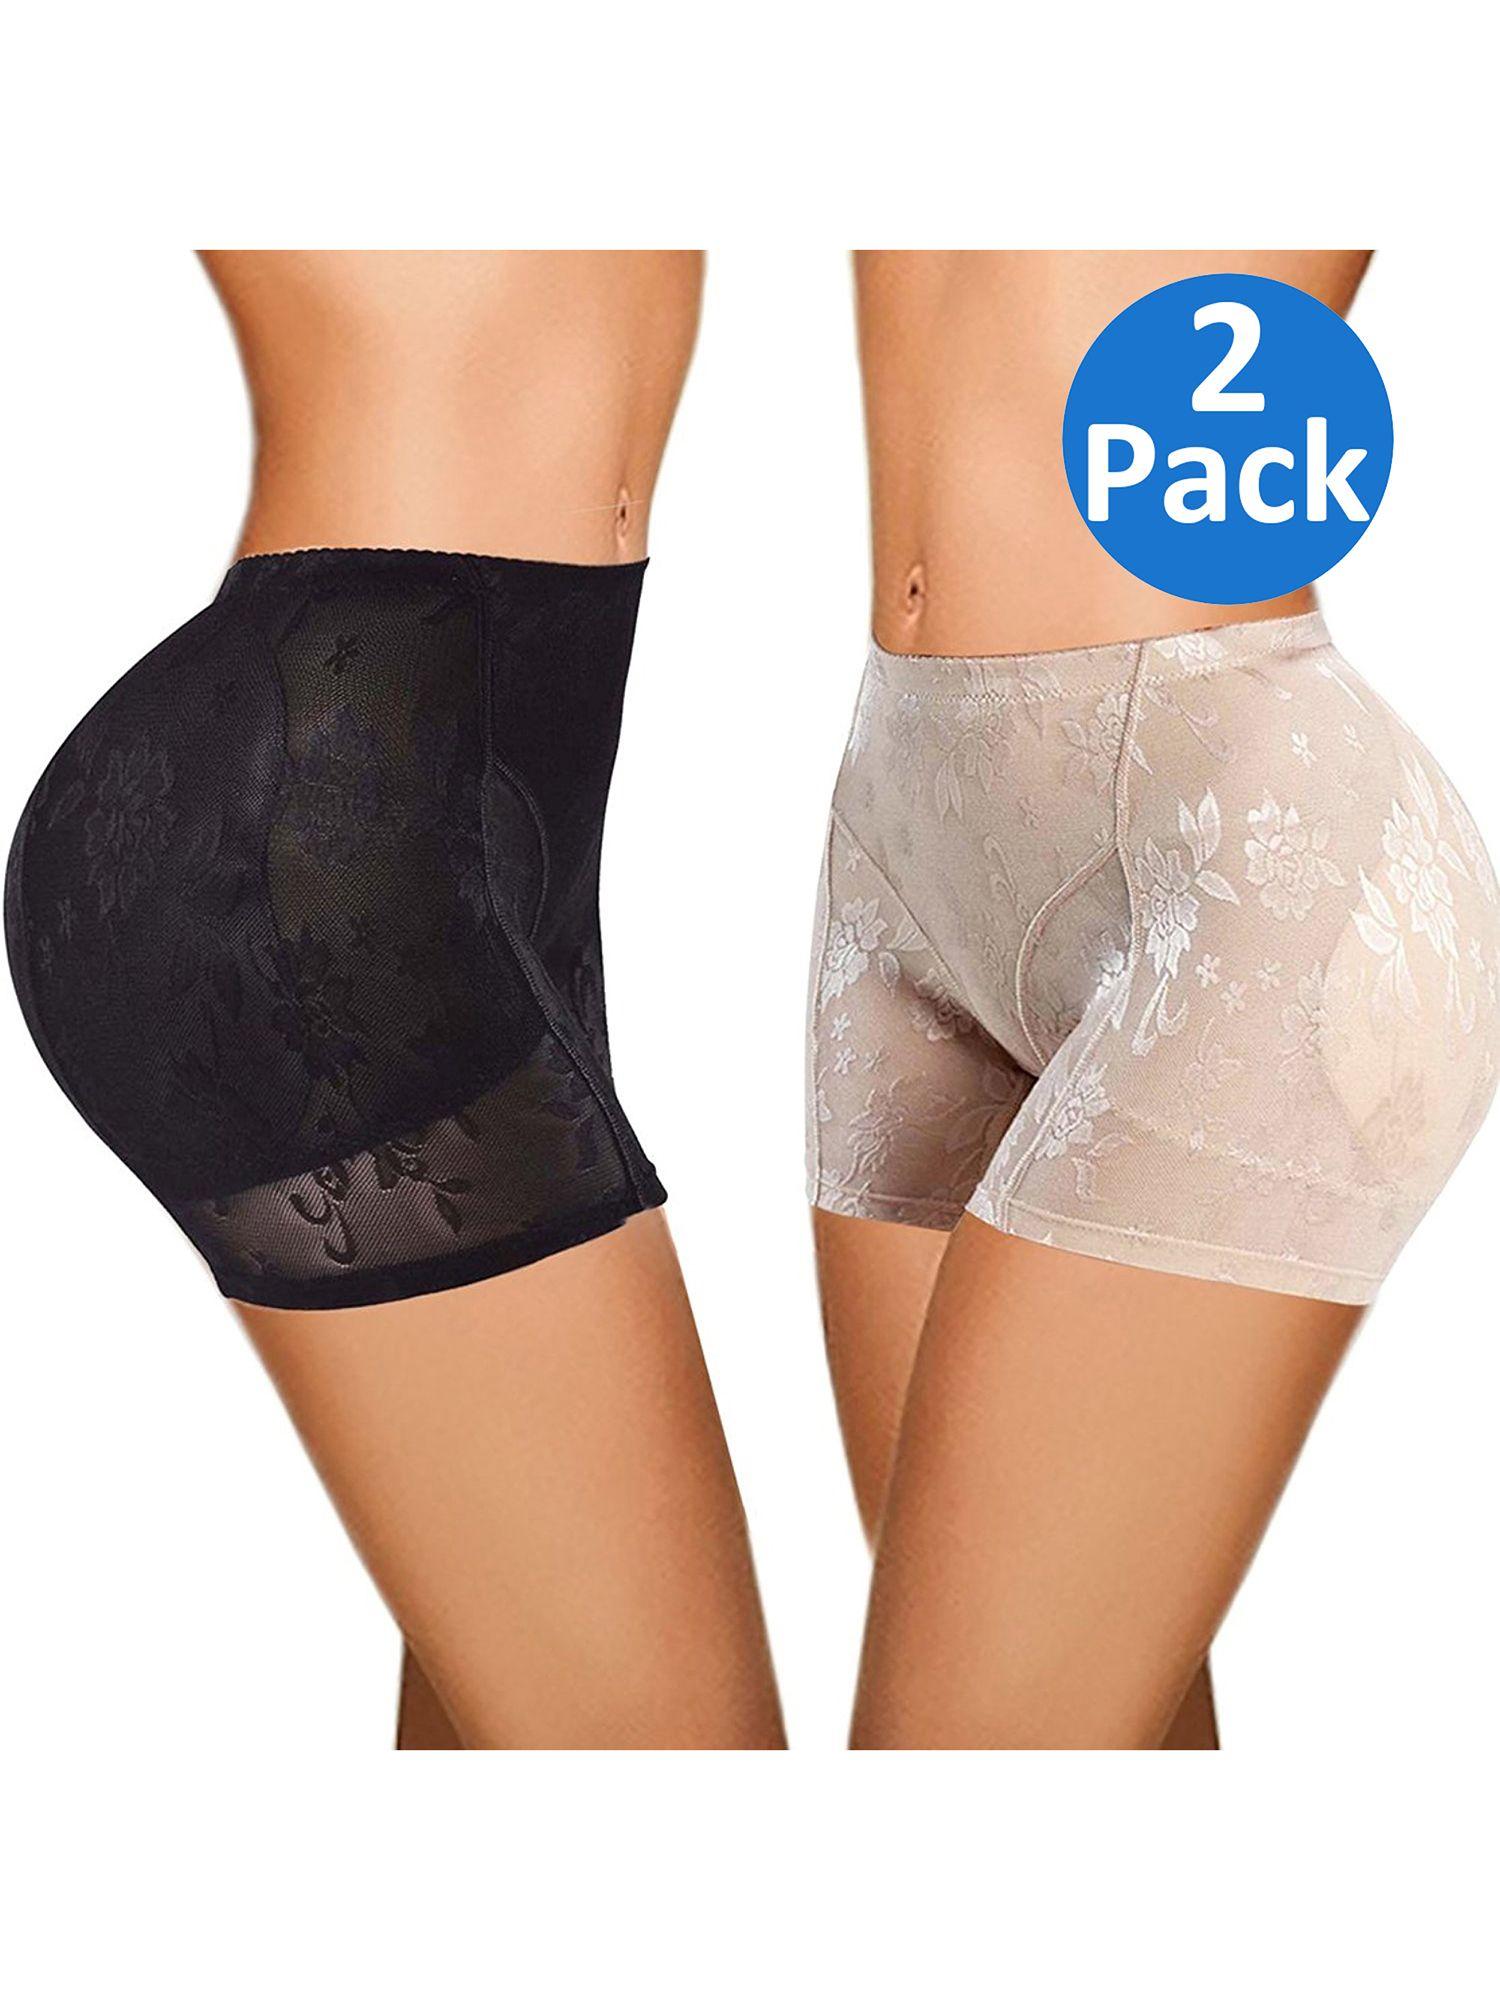 c68f1394b SAYFUT Butt Lifter Padded Panty Enhancing Body Shaper for Women Shapewear Boyshorts  Control Panties Black Nude Plus Size Enhancing